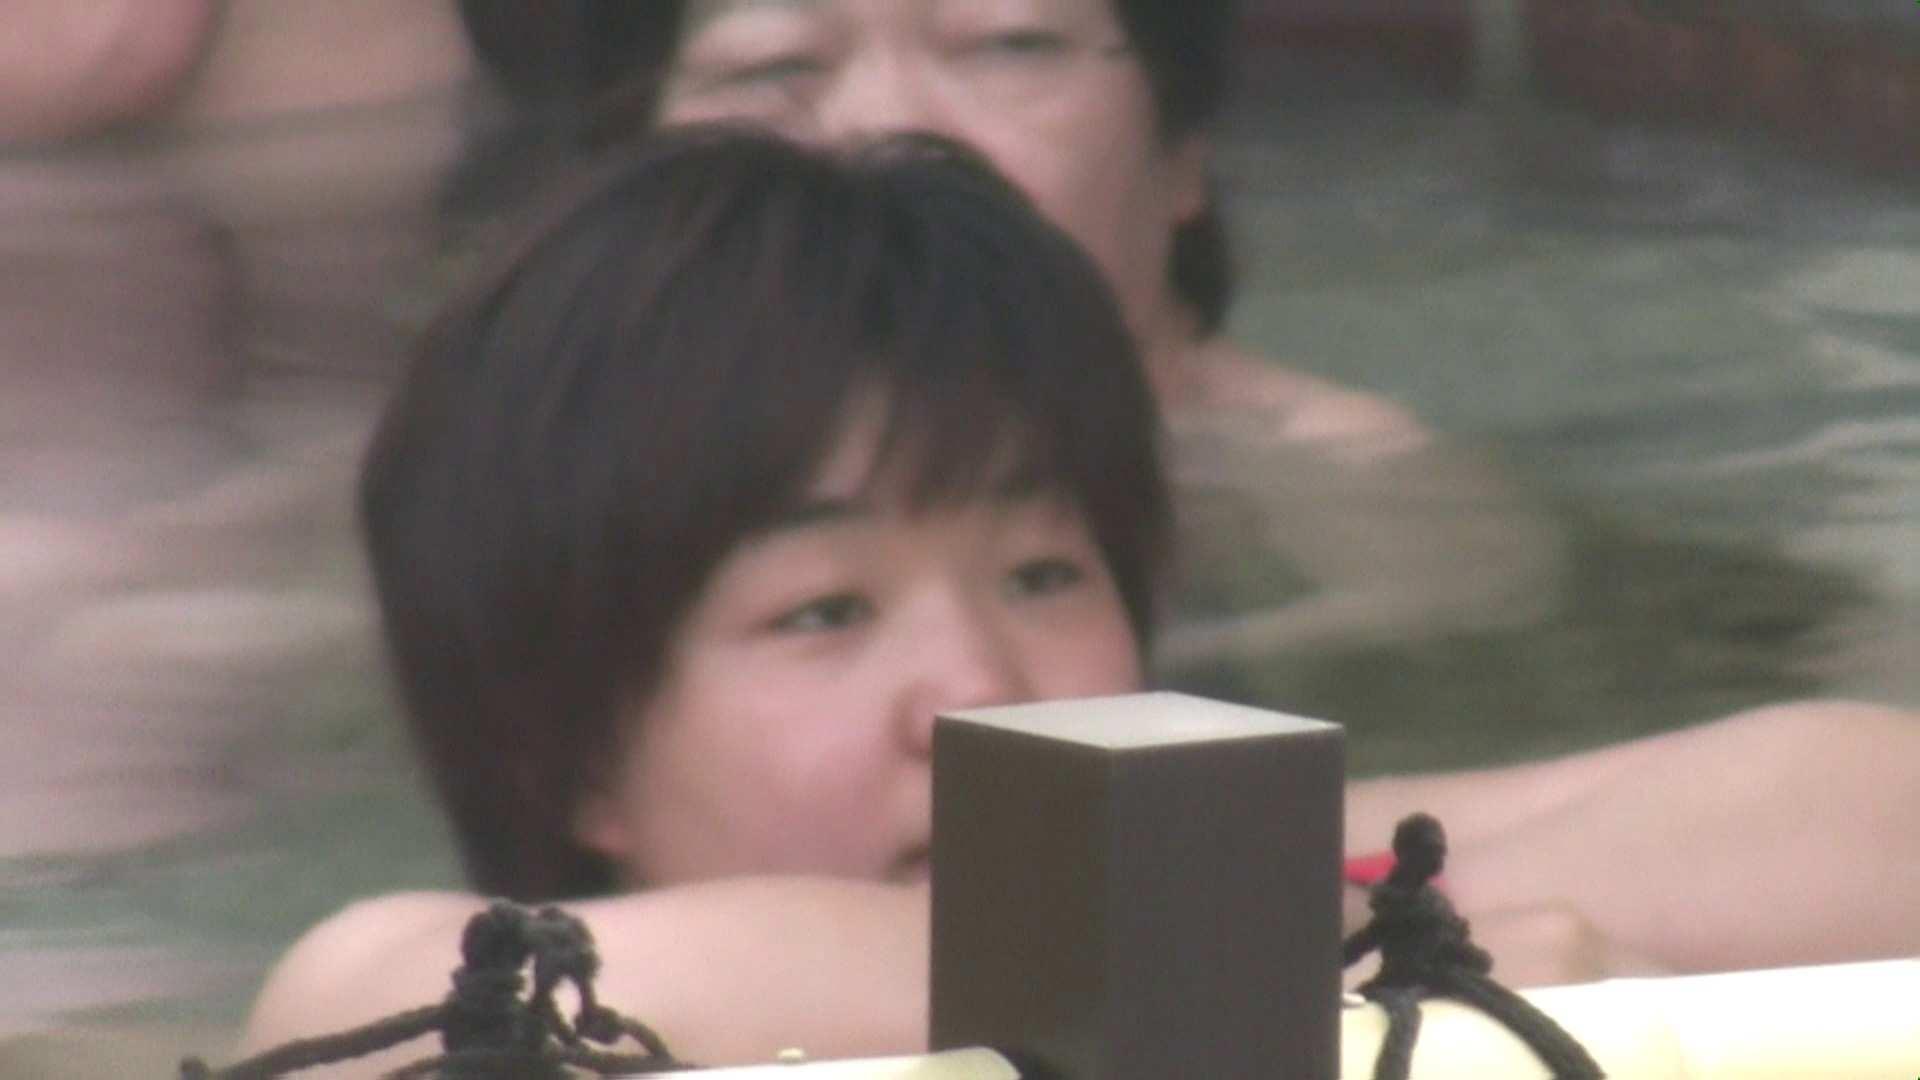 Aquaな露天風呂Vol.53【VIP限定】 女体盗撮 | OL女体  93連発 37